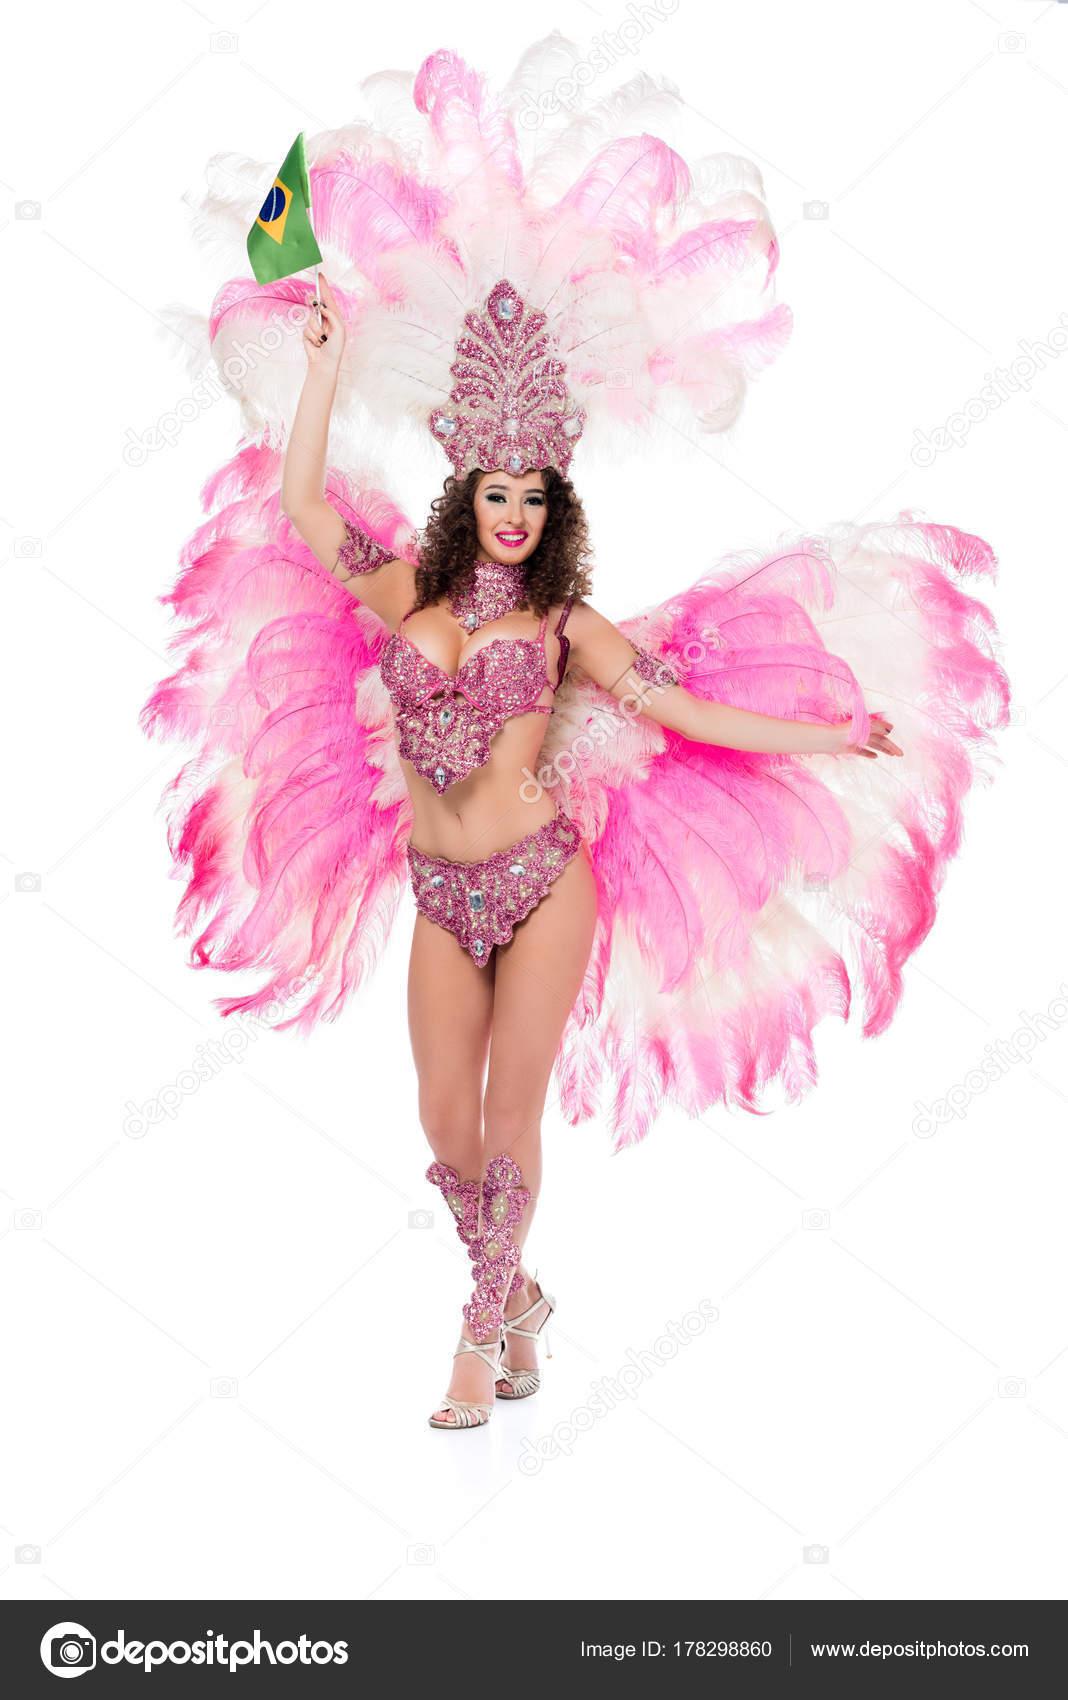 9bf8984102dc Sonriente Mujer Traje Carnaval Celebración Brasileña Fllag Mano ...